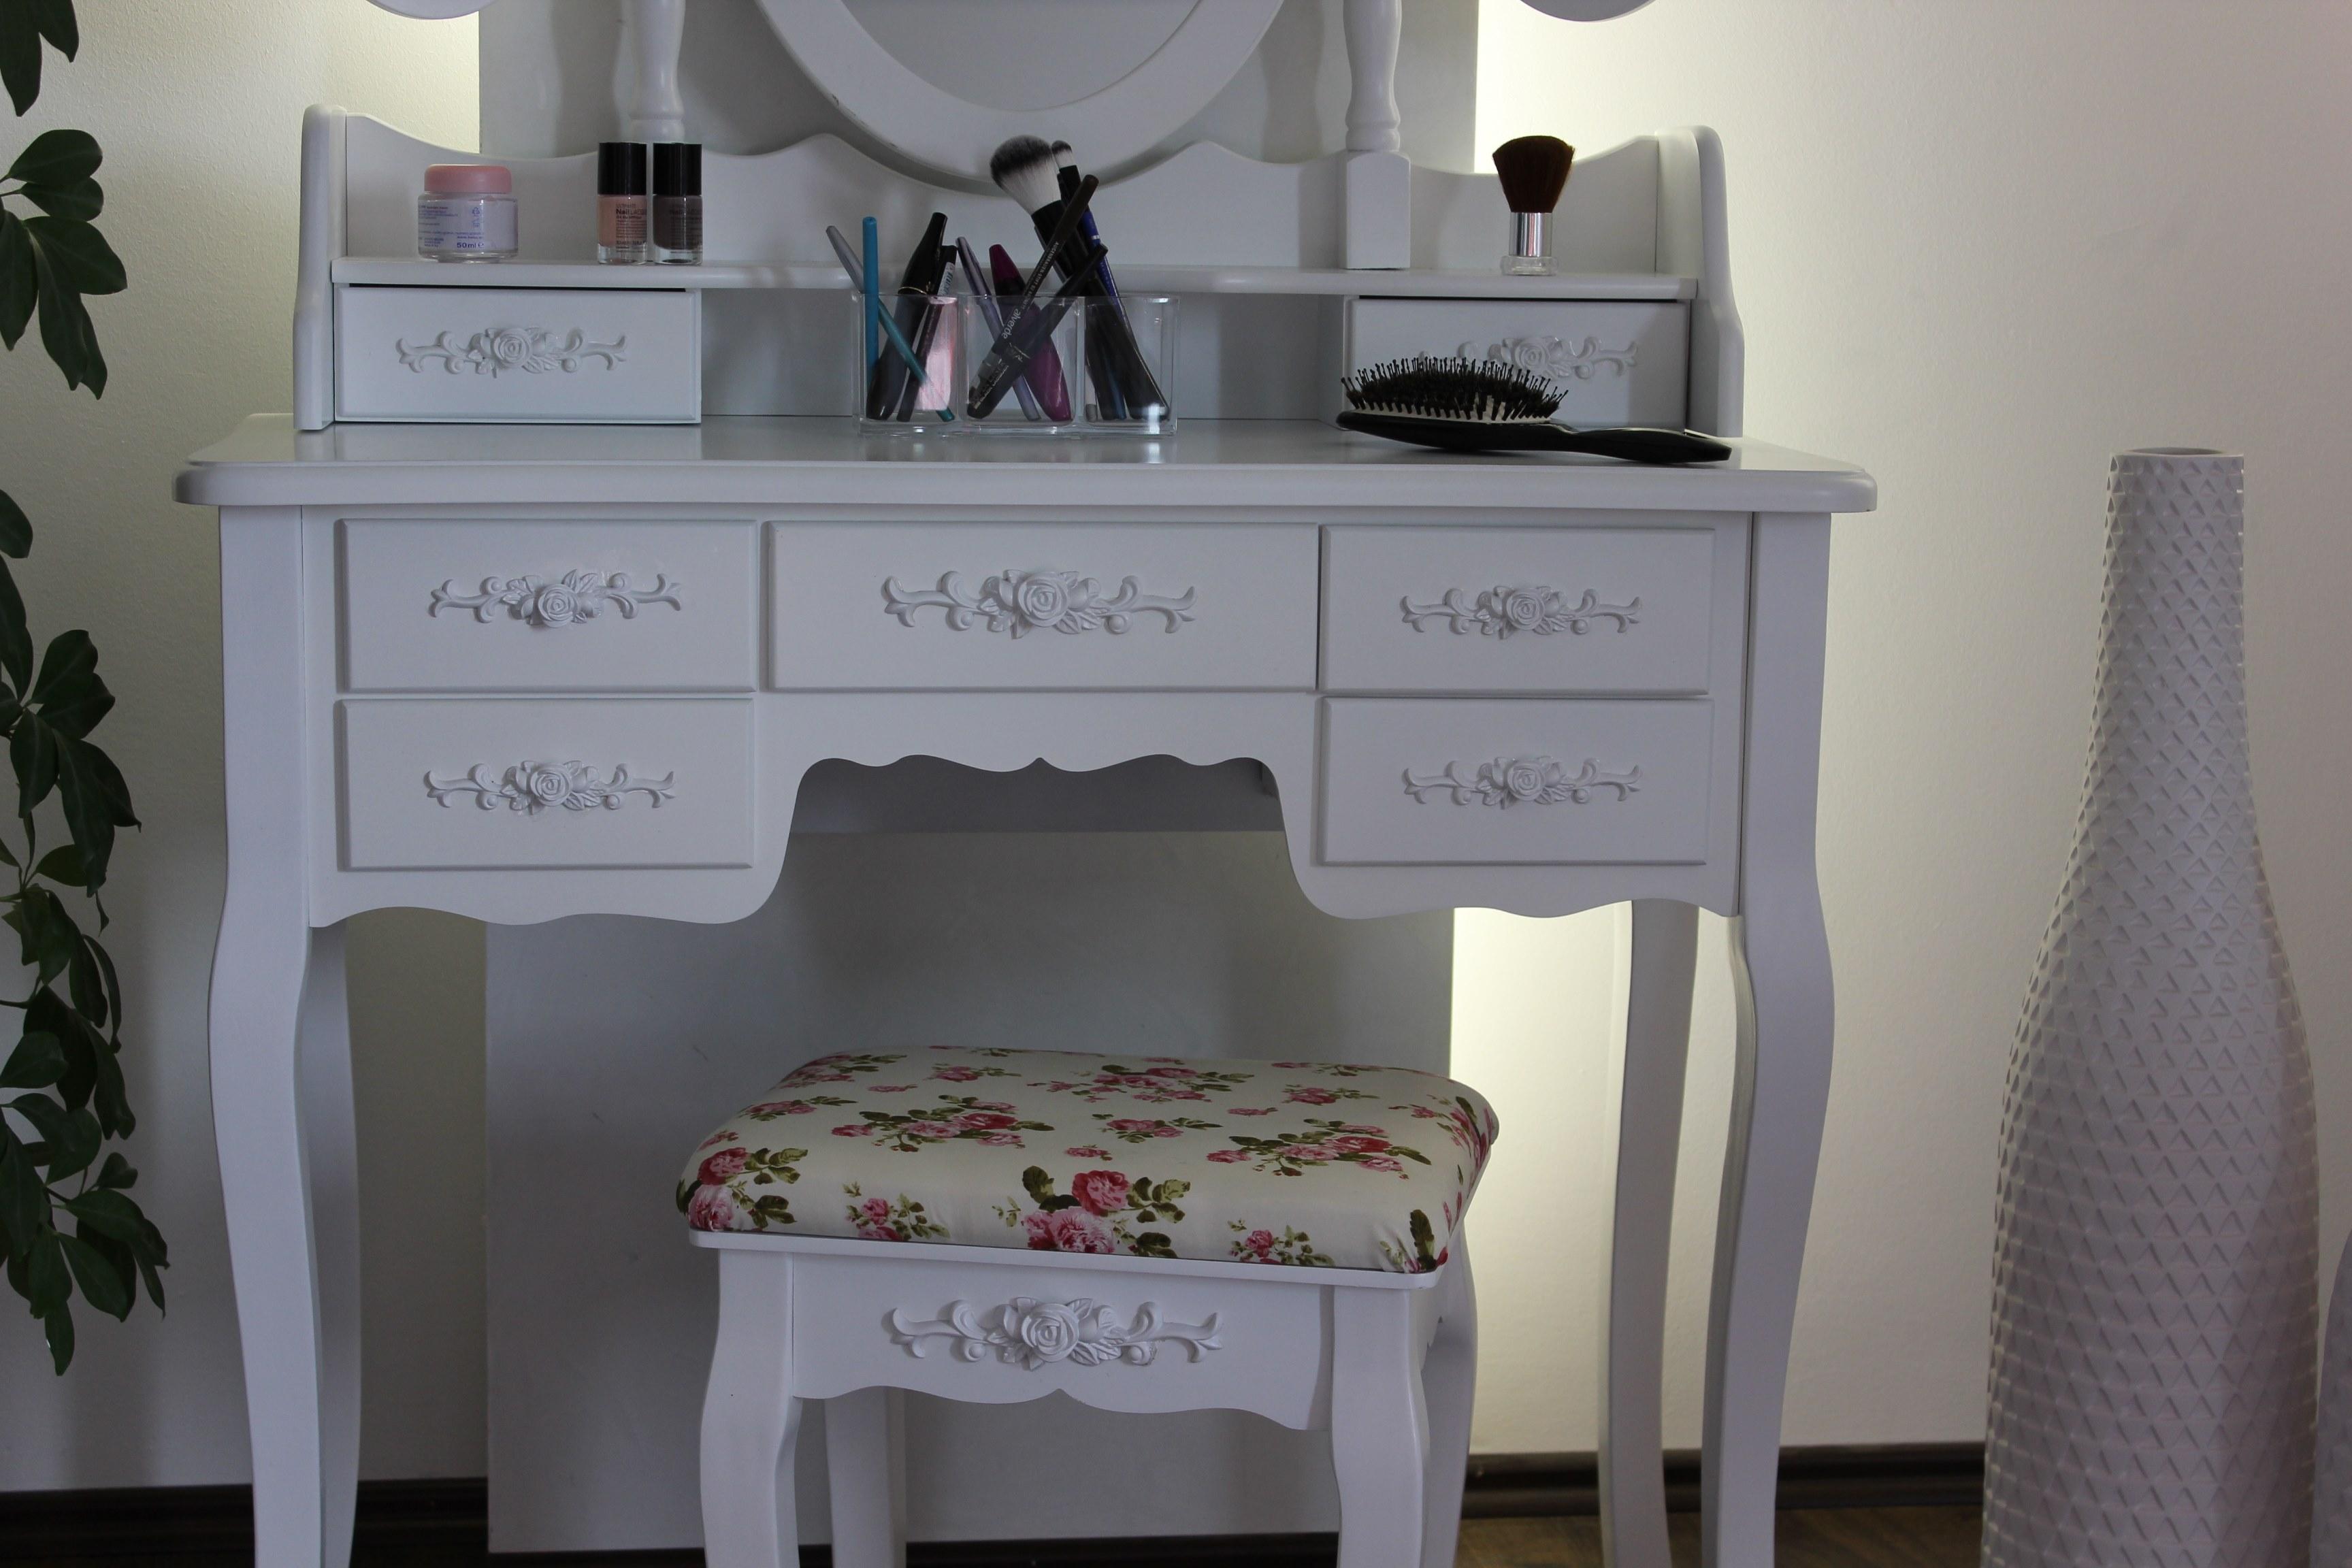 xxlschminktisch inkl hocker spiegel frisiertisch. Black Bedroom Furniture Sets. Home Design Ideas